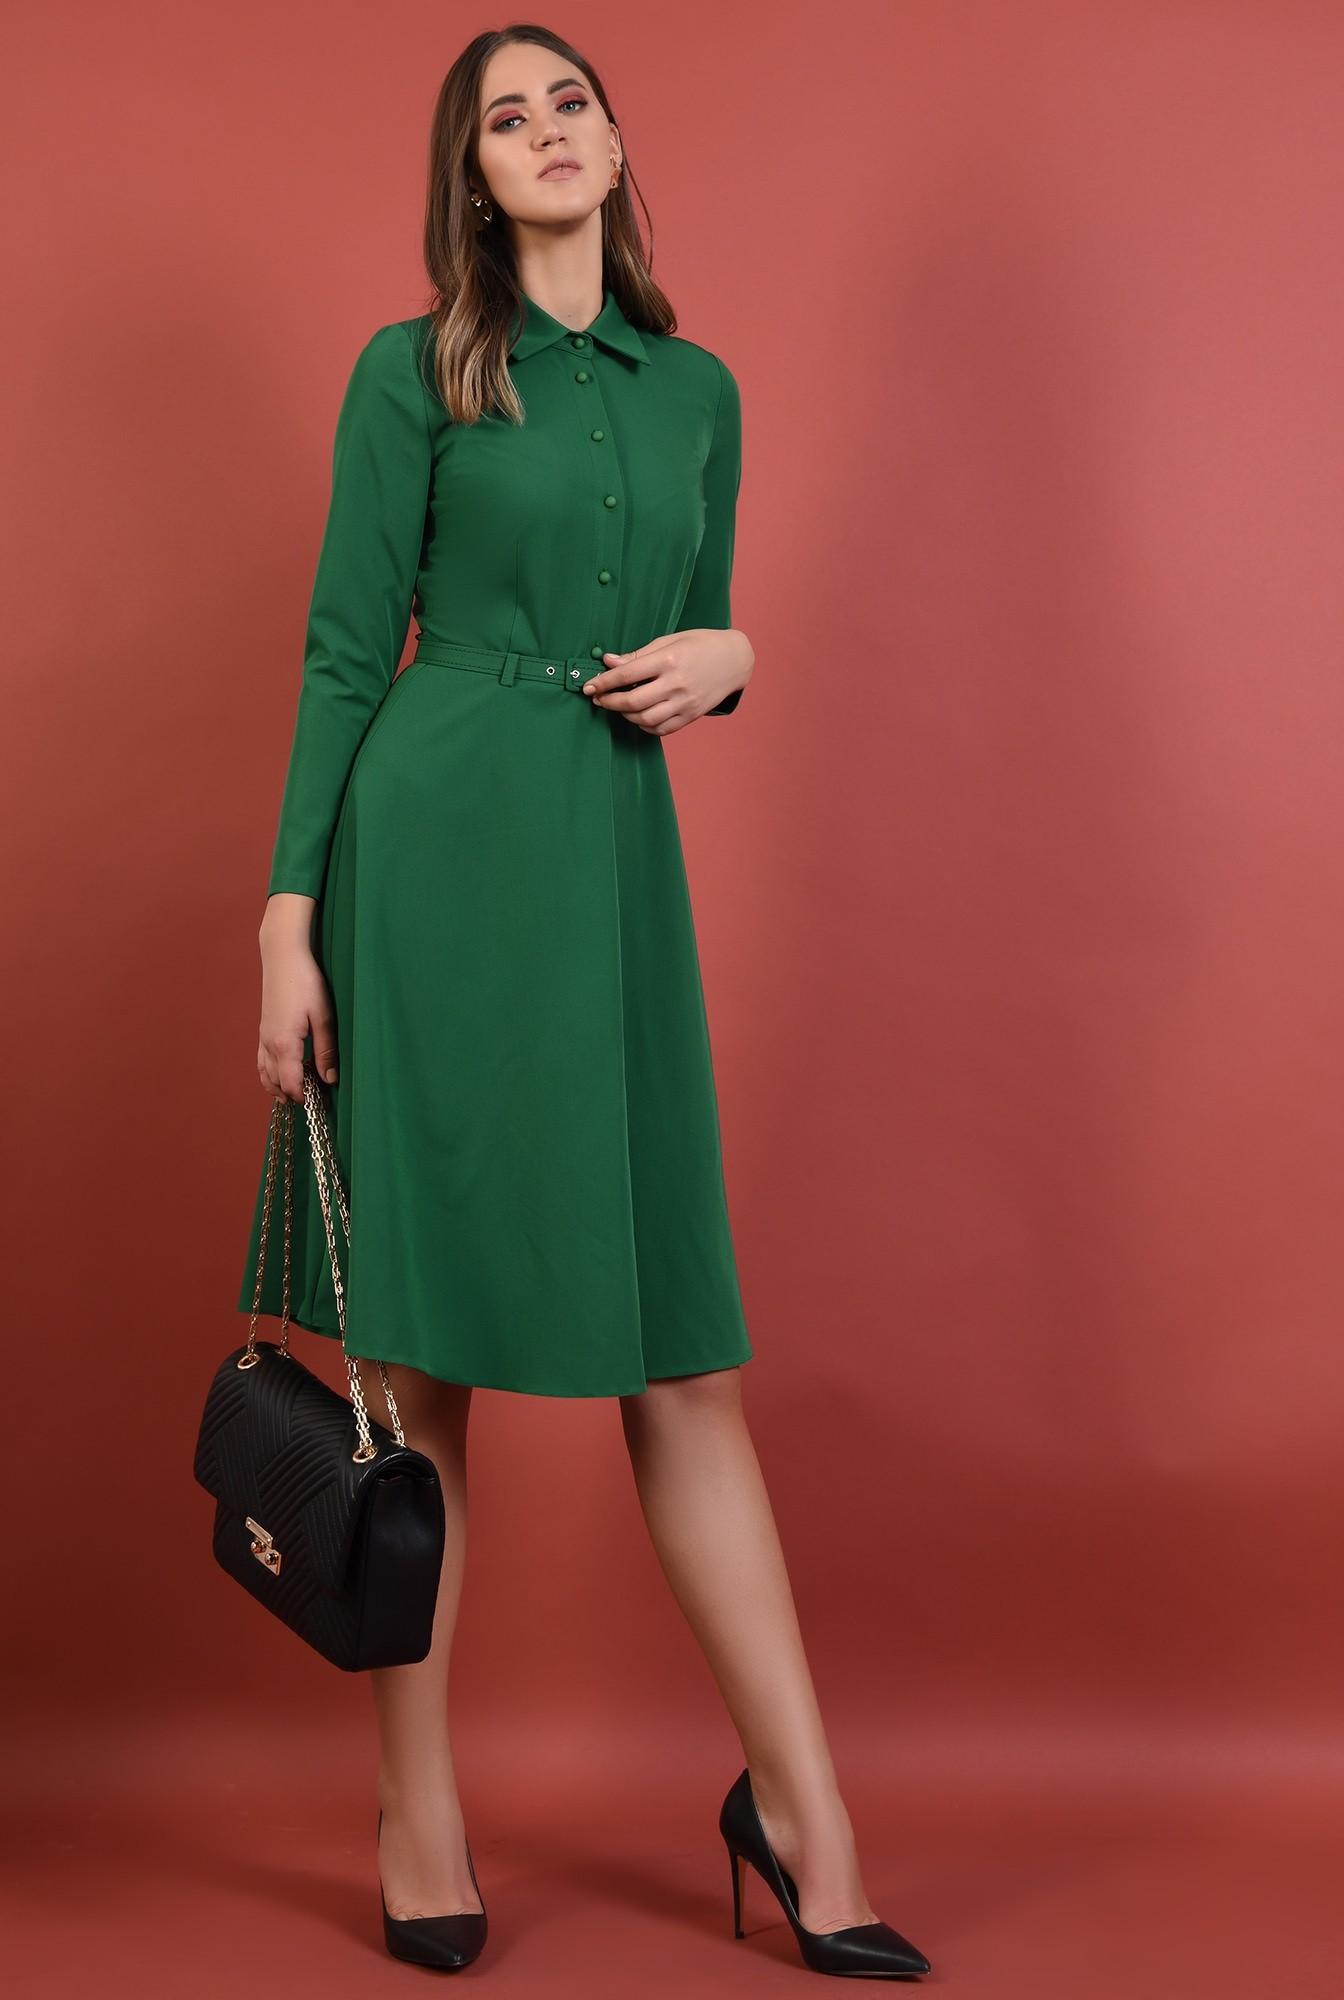 3 - 360 - rochie verde, office, midi, croi evazat, maneci lungi, curea, Poema